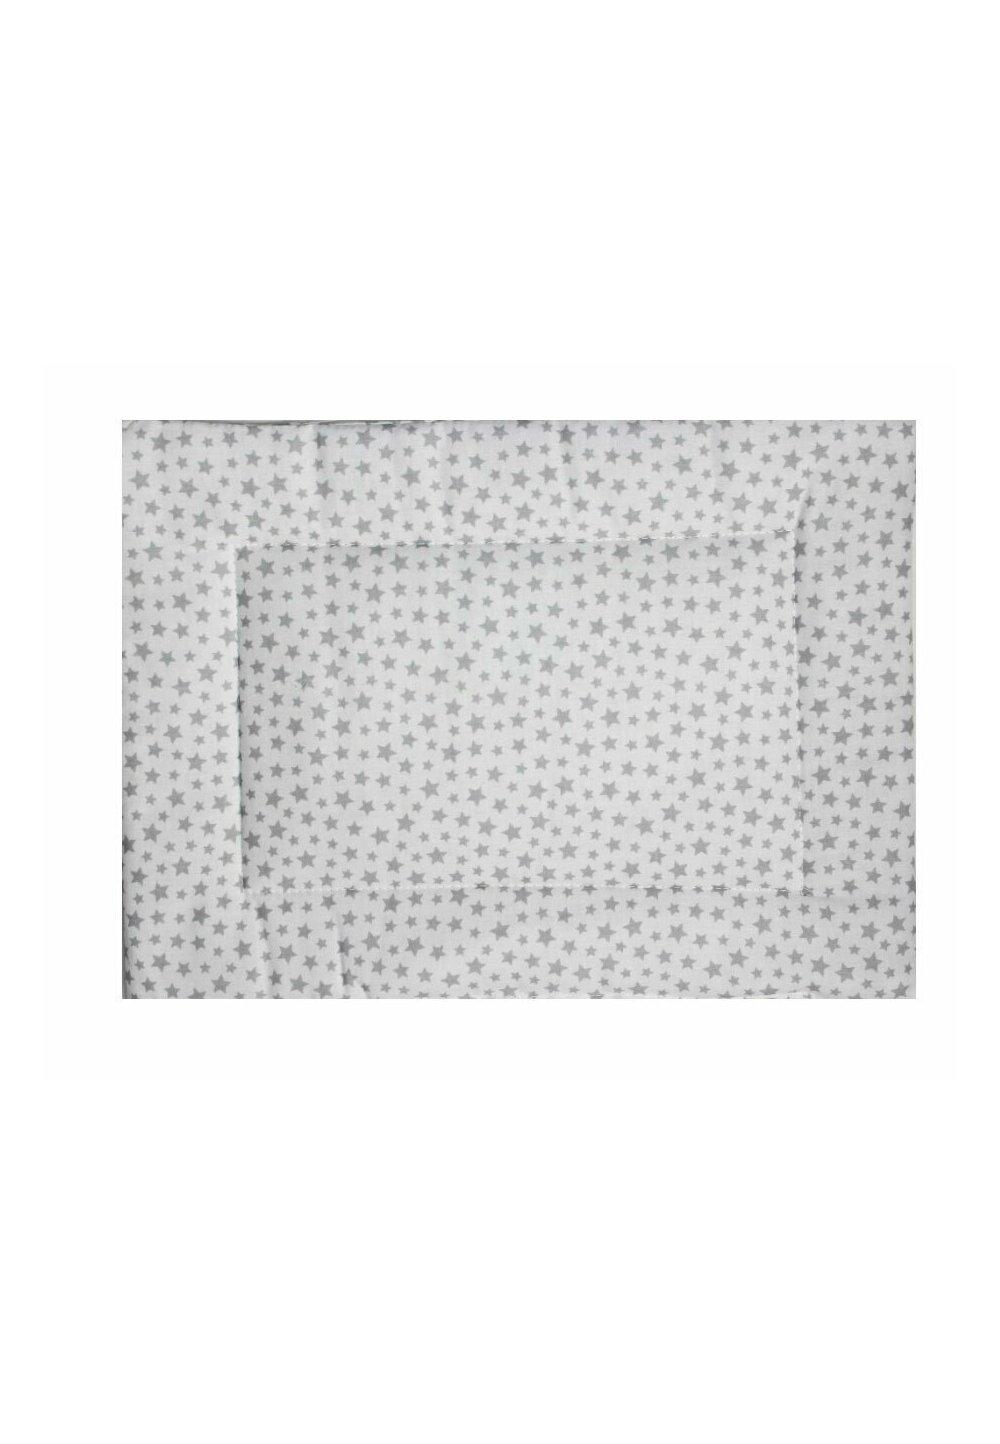 Perna slim, alb cu stele gri, 37x28cm imagine